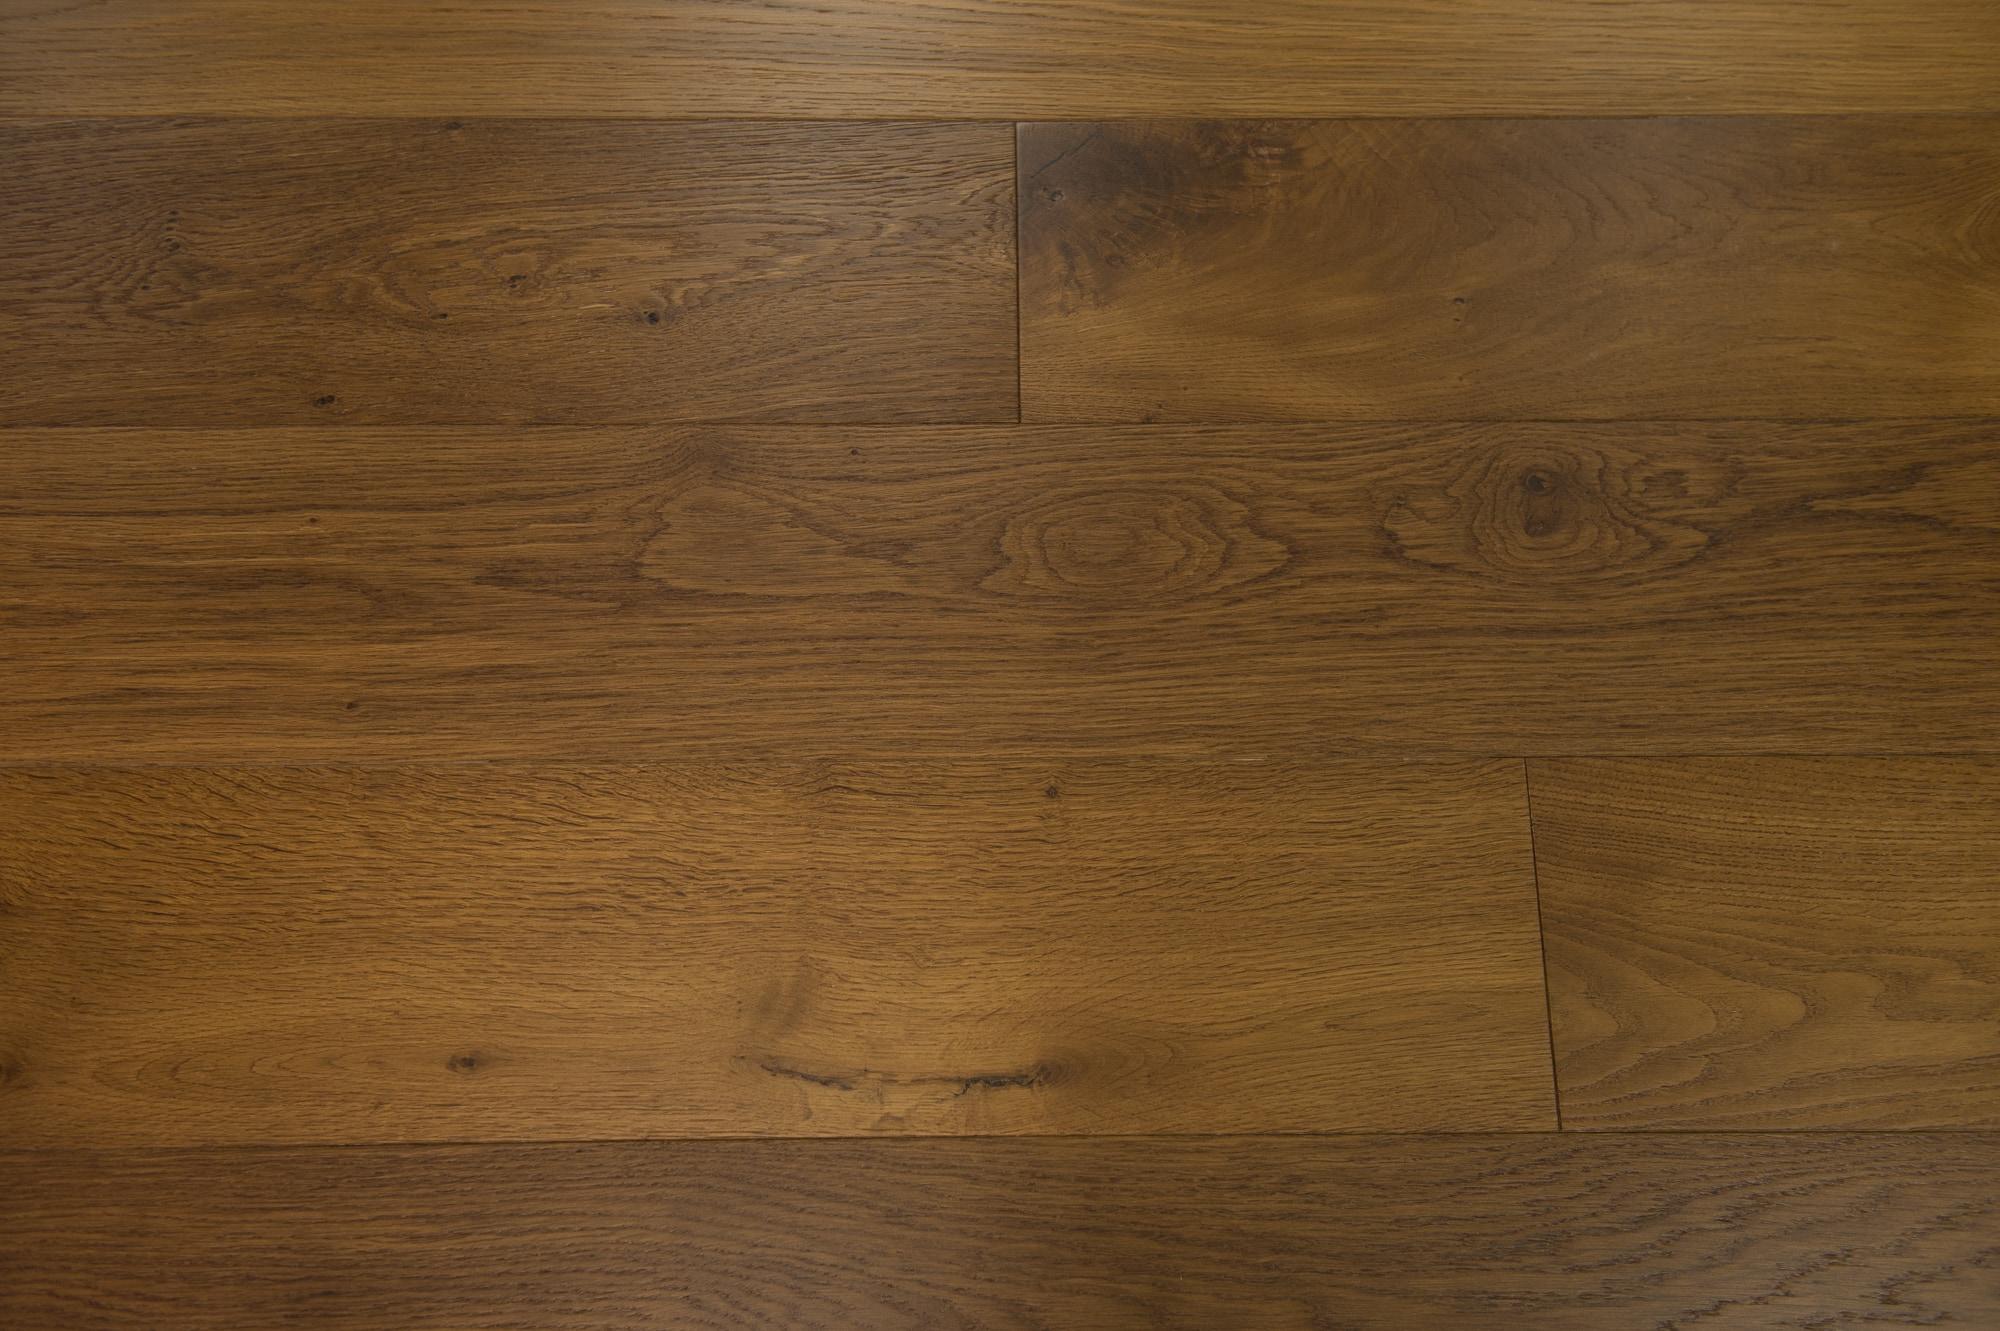 Chestnut / European Oak / Urethane / ABCD / Sample Engineered Hardwood - European Oak - Canyon Collection 0